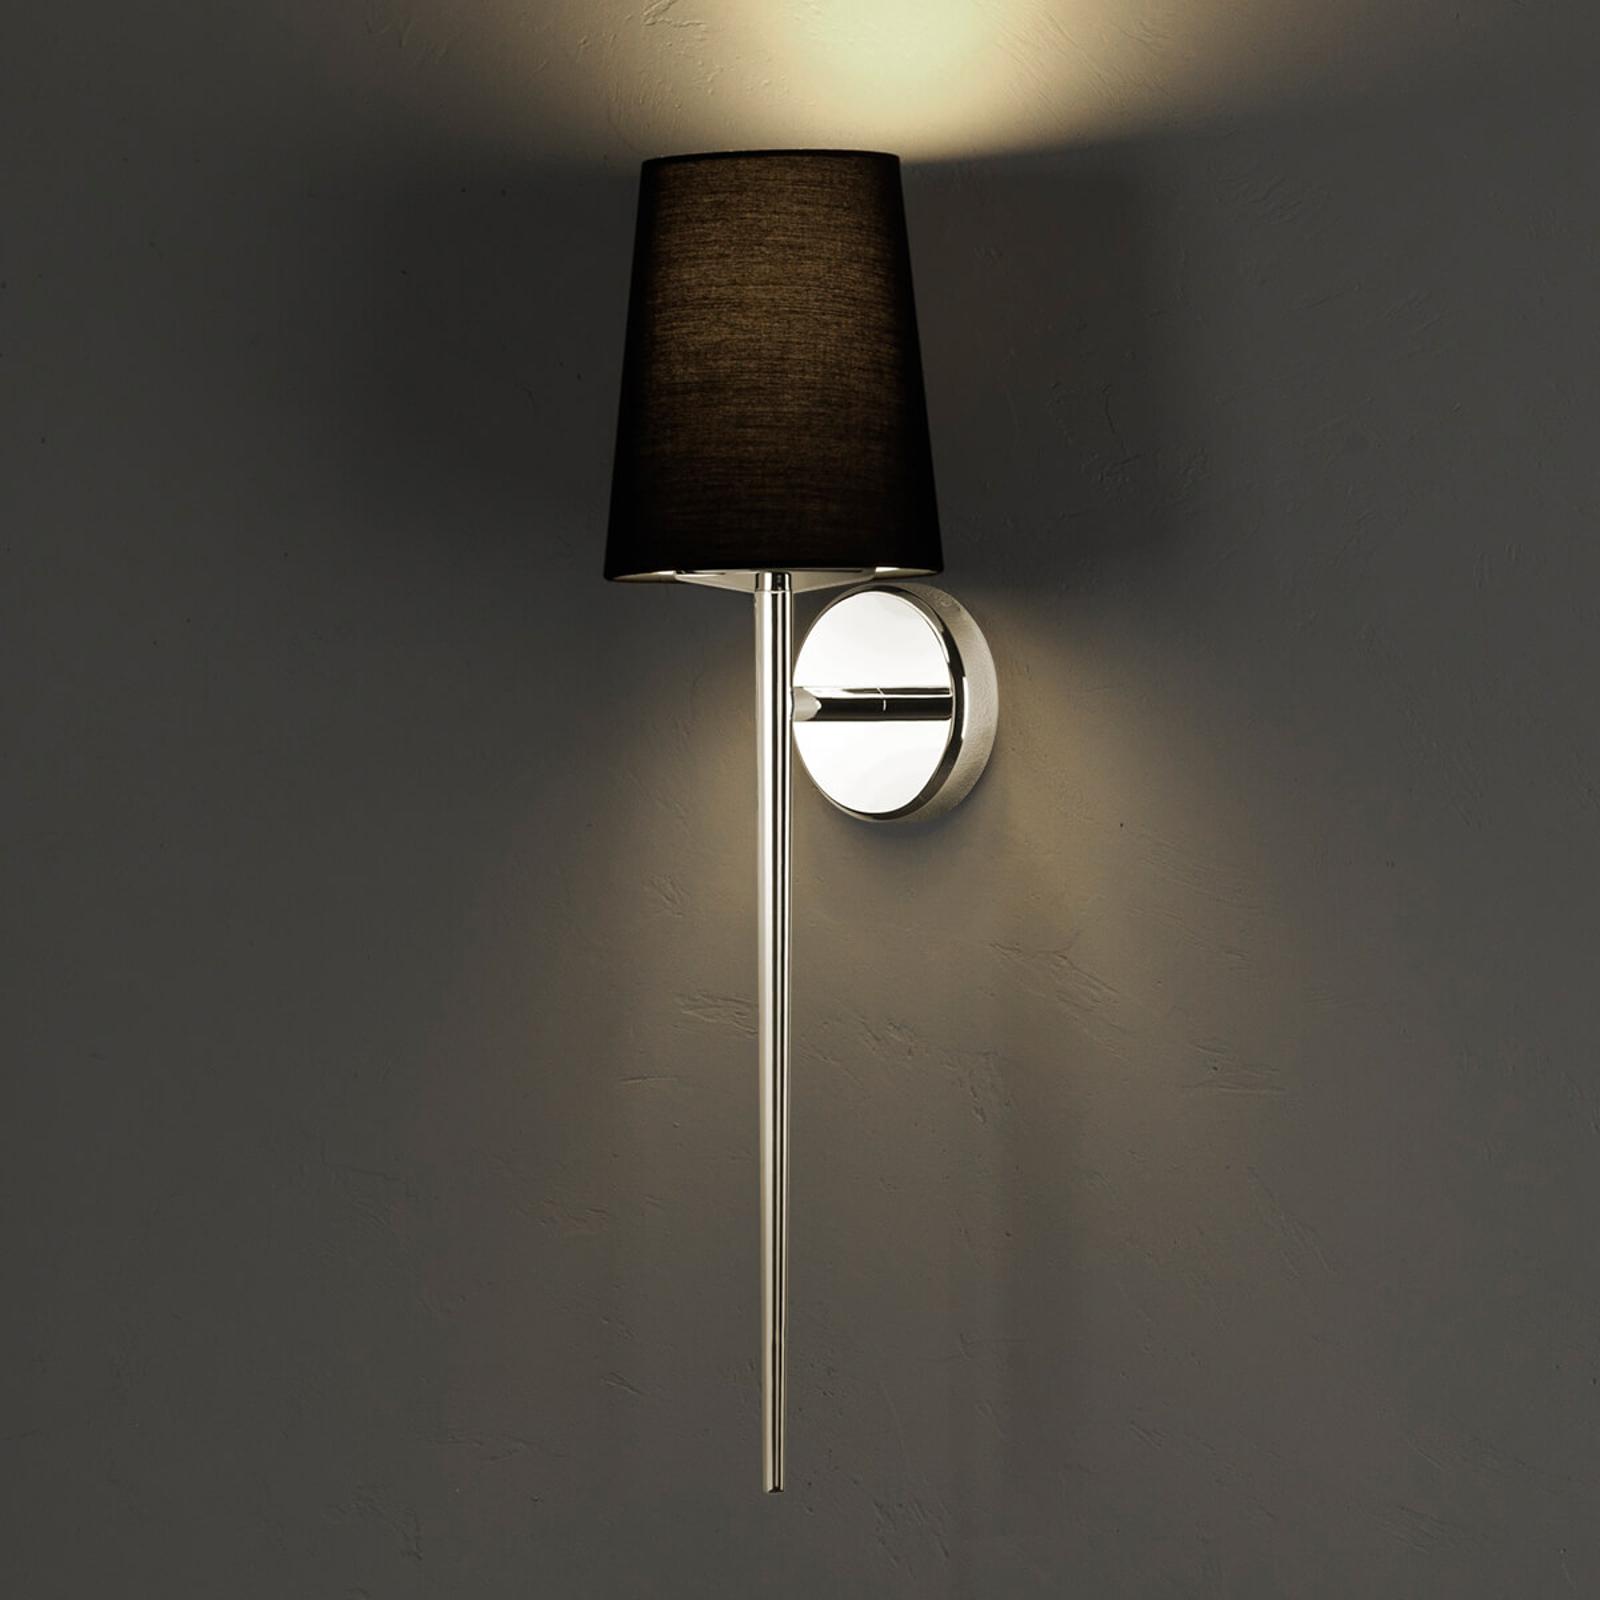 Stijlvol vormgegeven textiel wandlamp Deauville